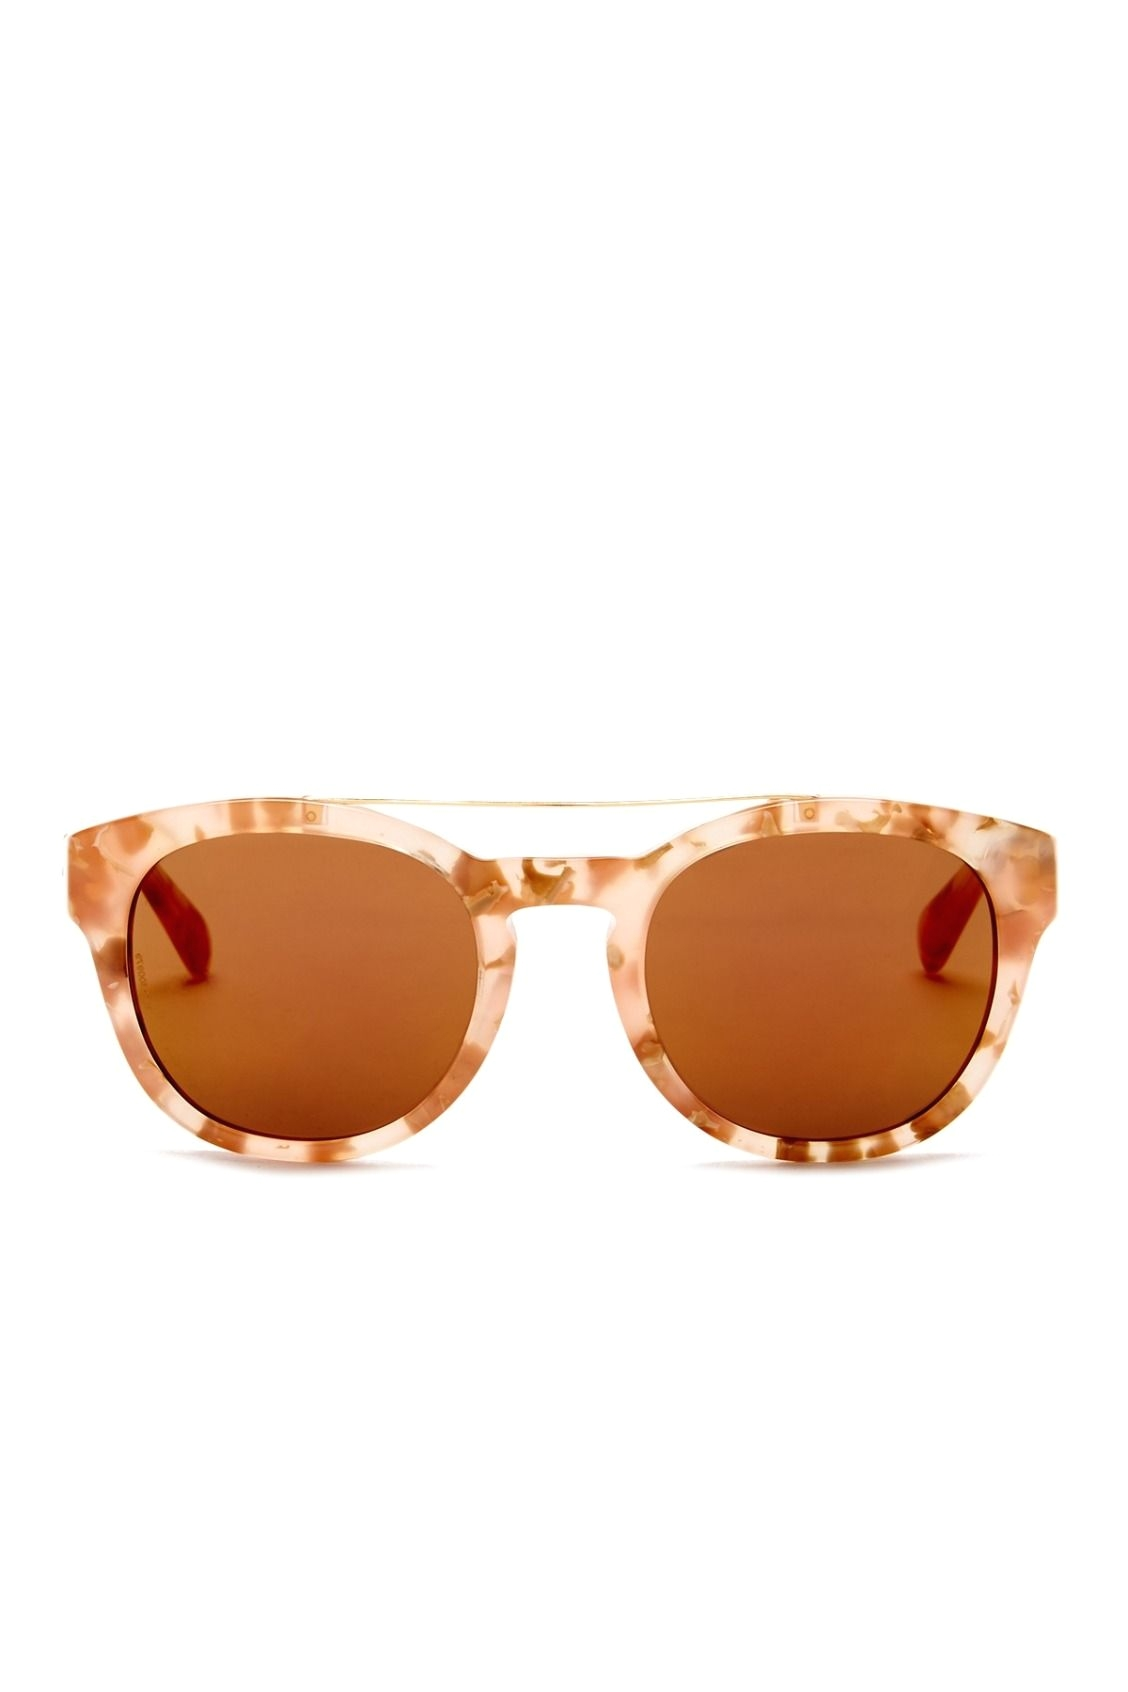 love these dolce gabbana women s urban essential round brow bar acetate frame sunglasses